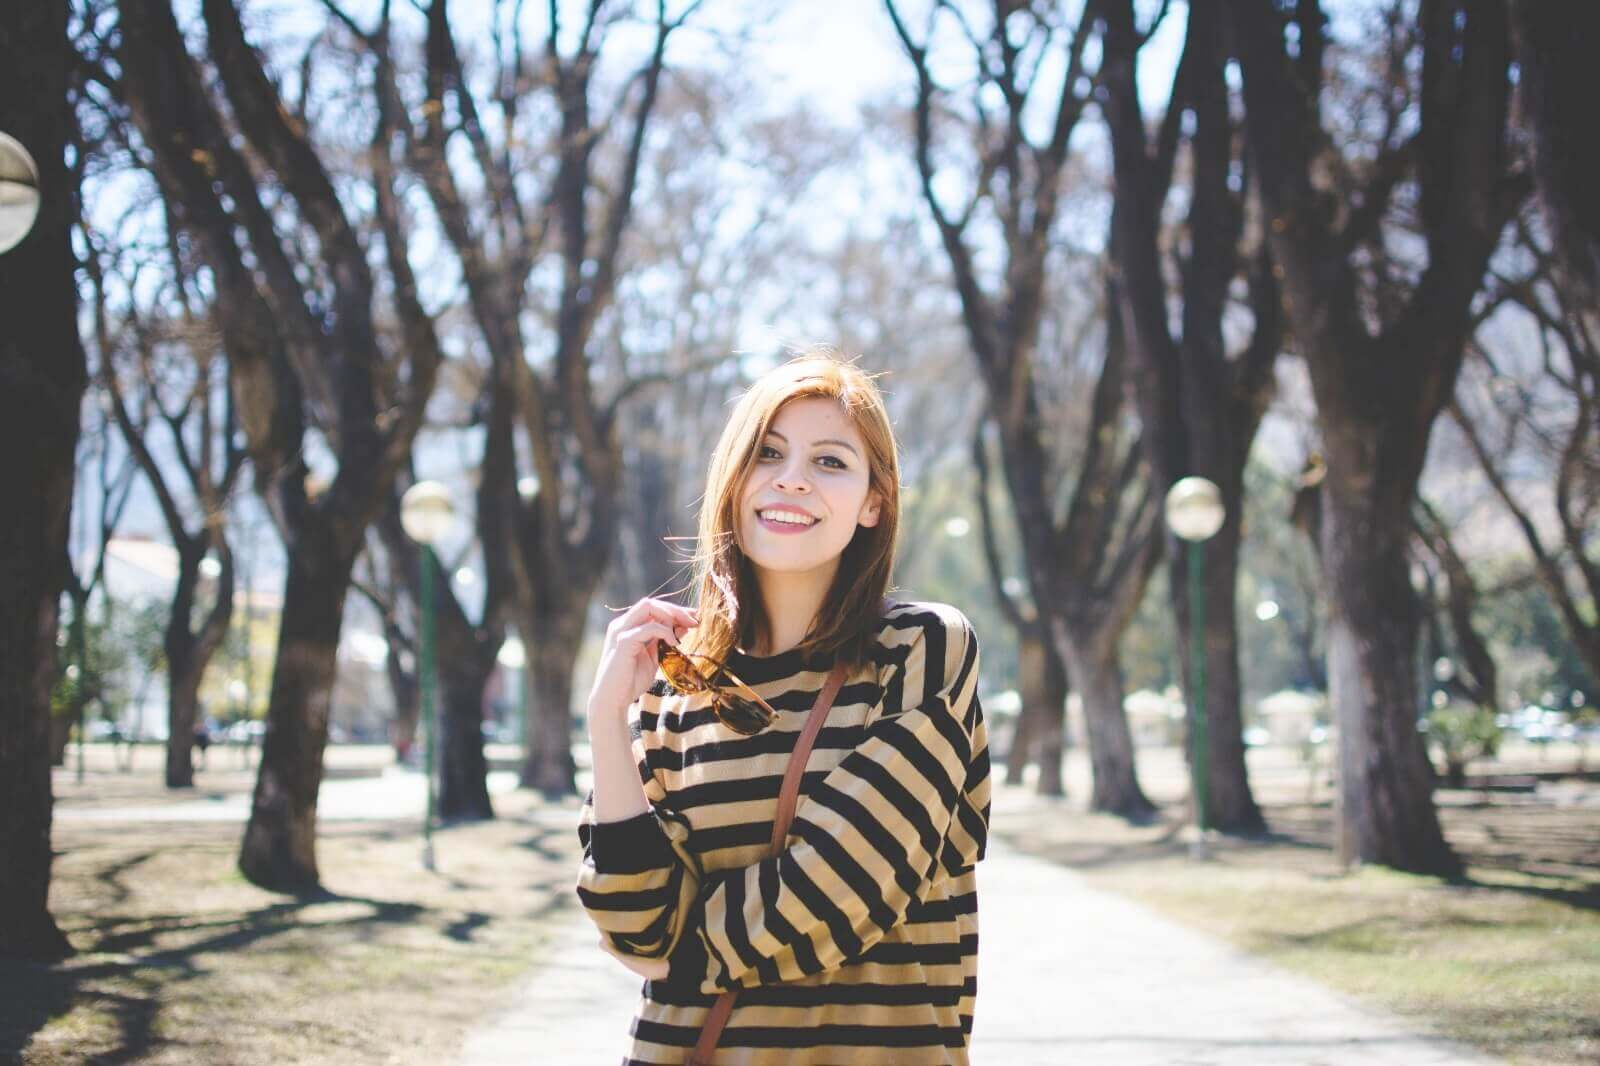 sammydress-block-heel-sandals-leopard-frame-light-brown-sammydress-sunglasses-deborah-ferrero-style-by-deb-streetstyle-salta-striped-sweater-fall2016-trends04